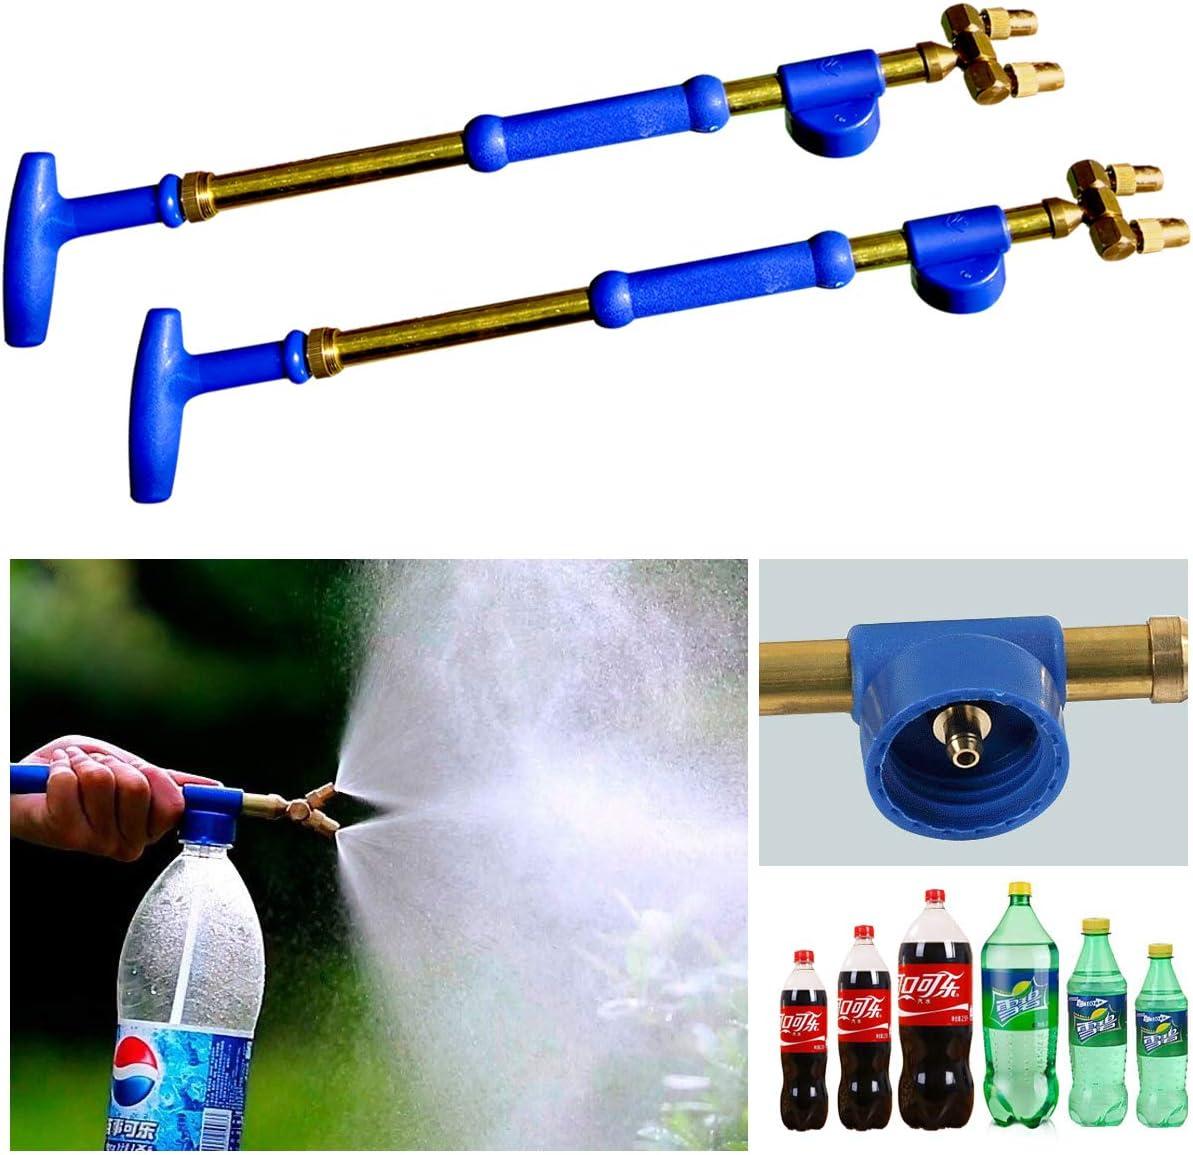 Eksahol Hand held Garden Sprayer Retractable Pump Pressure Water Sprayers, Portable Watering Gun for Lawn, Garden, Home, Office Cleaning, Dual Adjustable Nozzles, 2 Pack